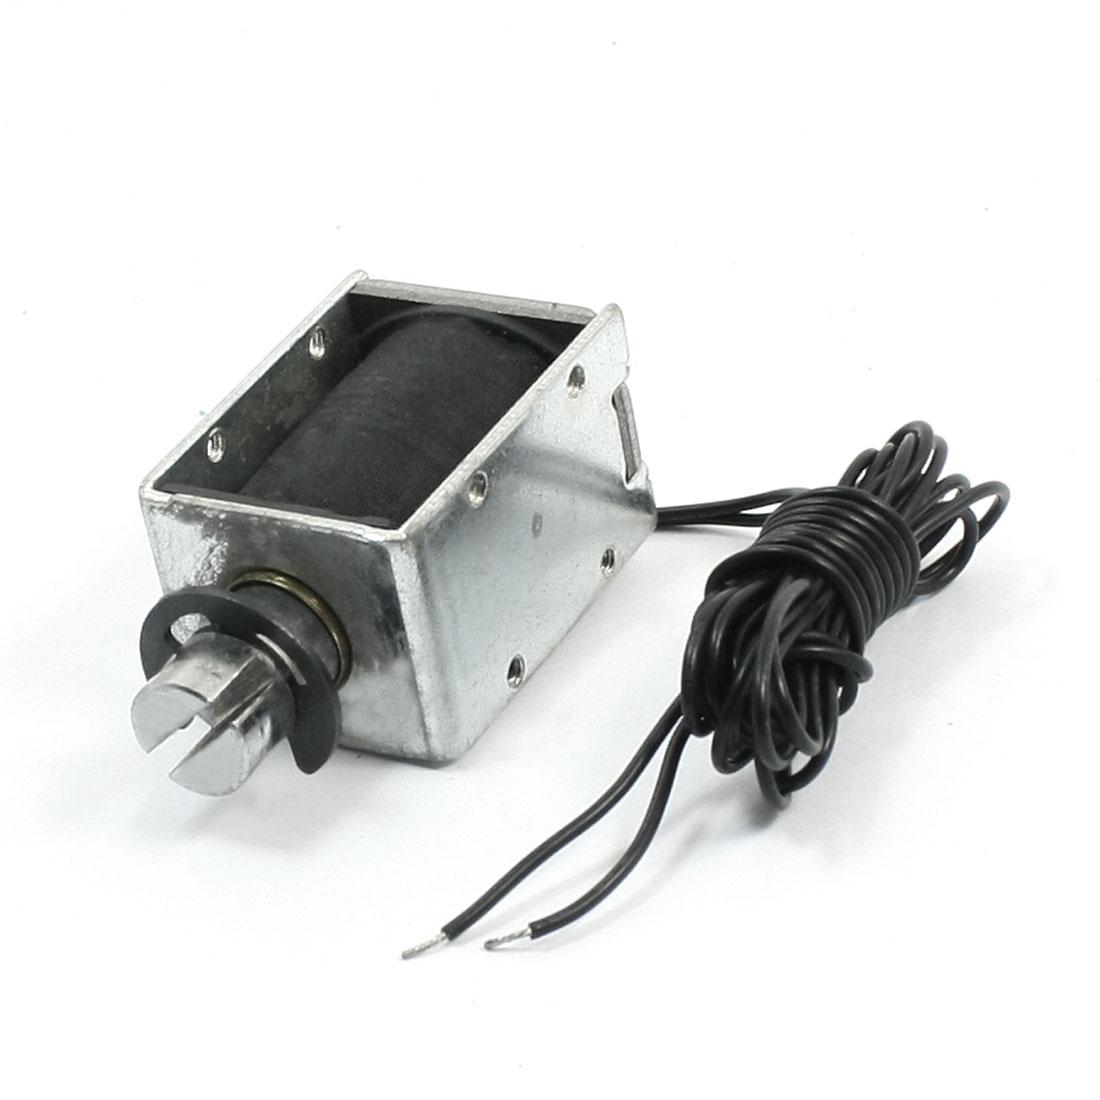 DC24V 800g Force 6mm Stroke 1M Lead Push Type Solenoid Electromagnet